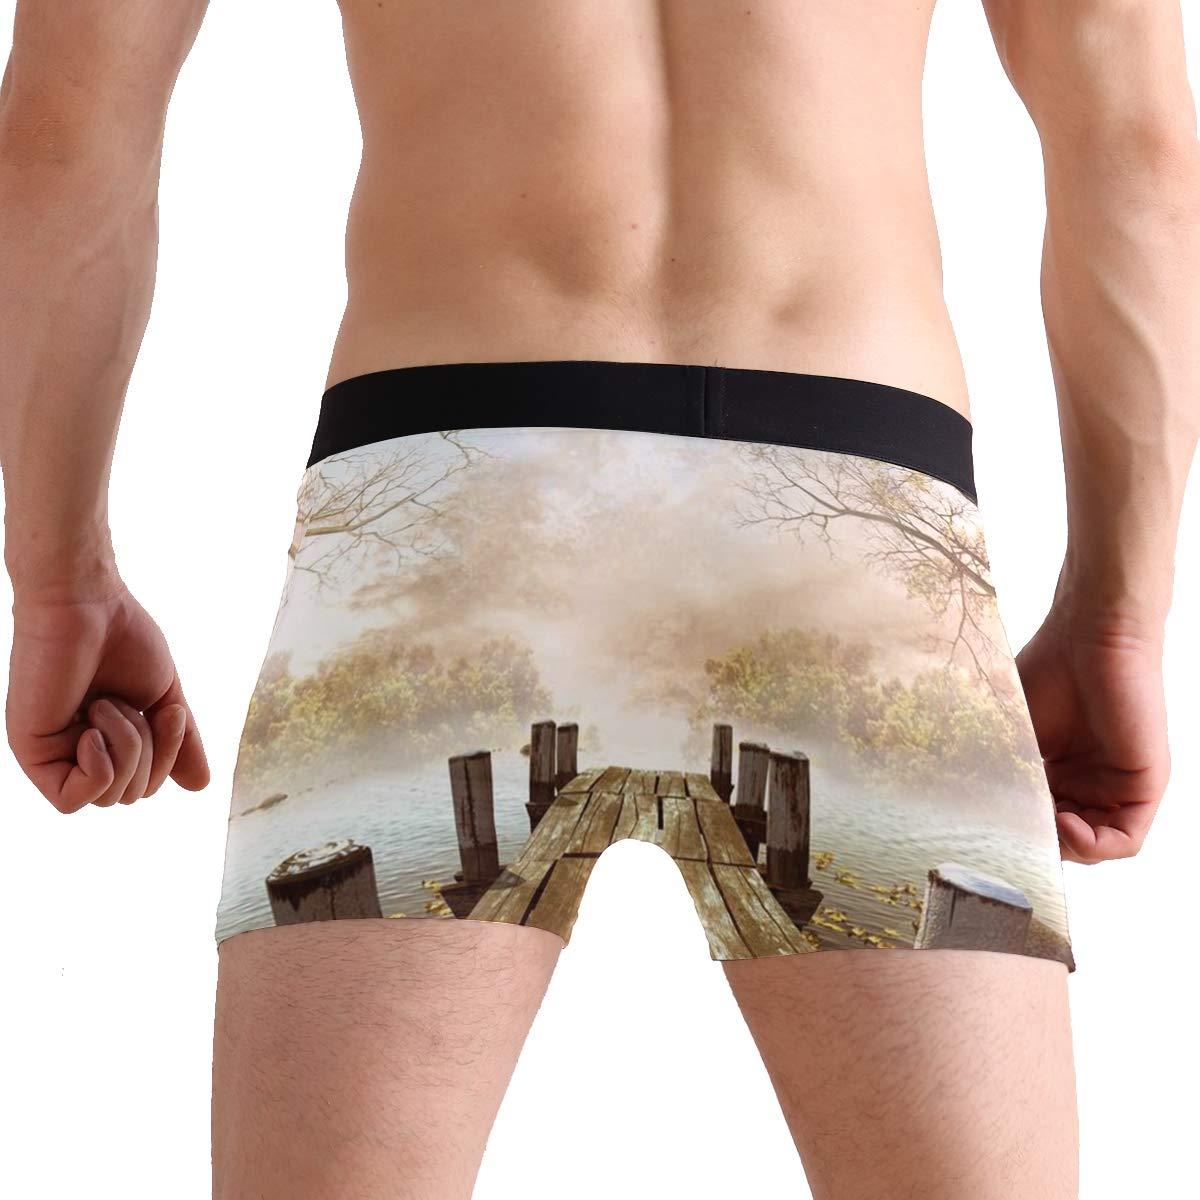 Mens Boxer Briefs Stretch Breathable Trunks Low Rise Ocean Decor Fall Wooden Bridge Seasons Lake House Underwear for Men Boys